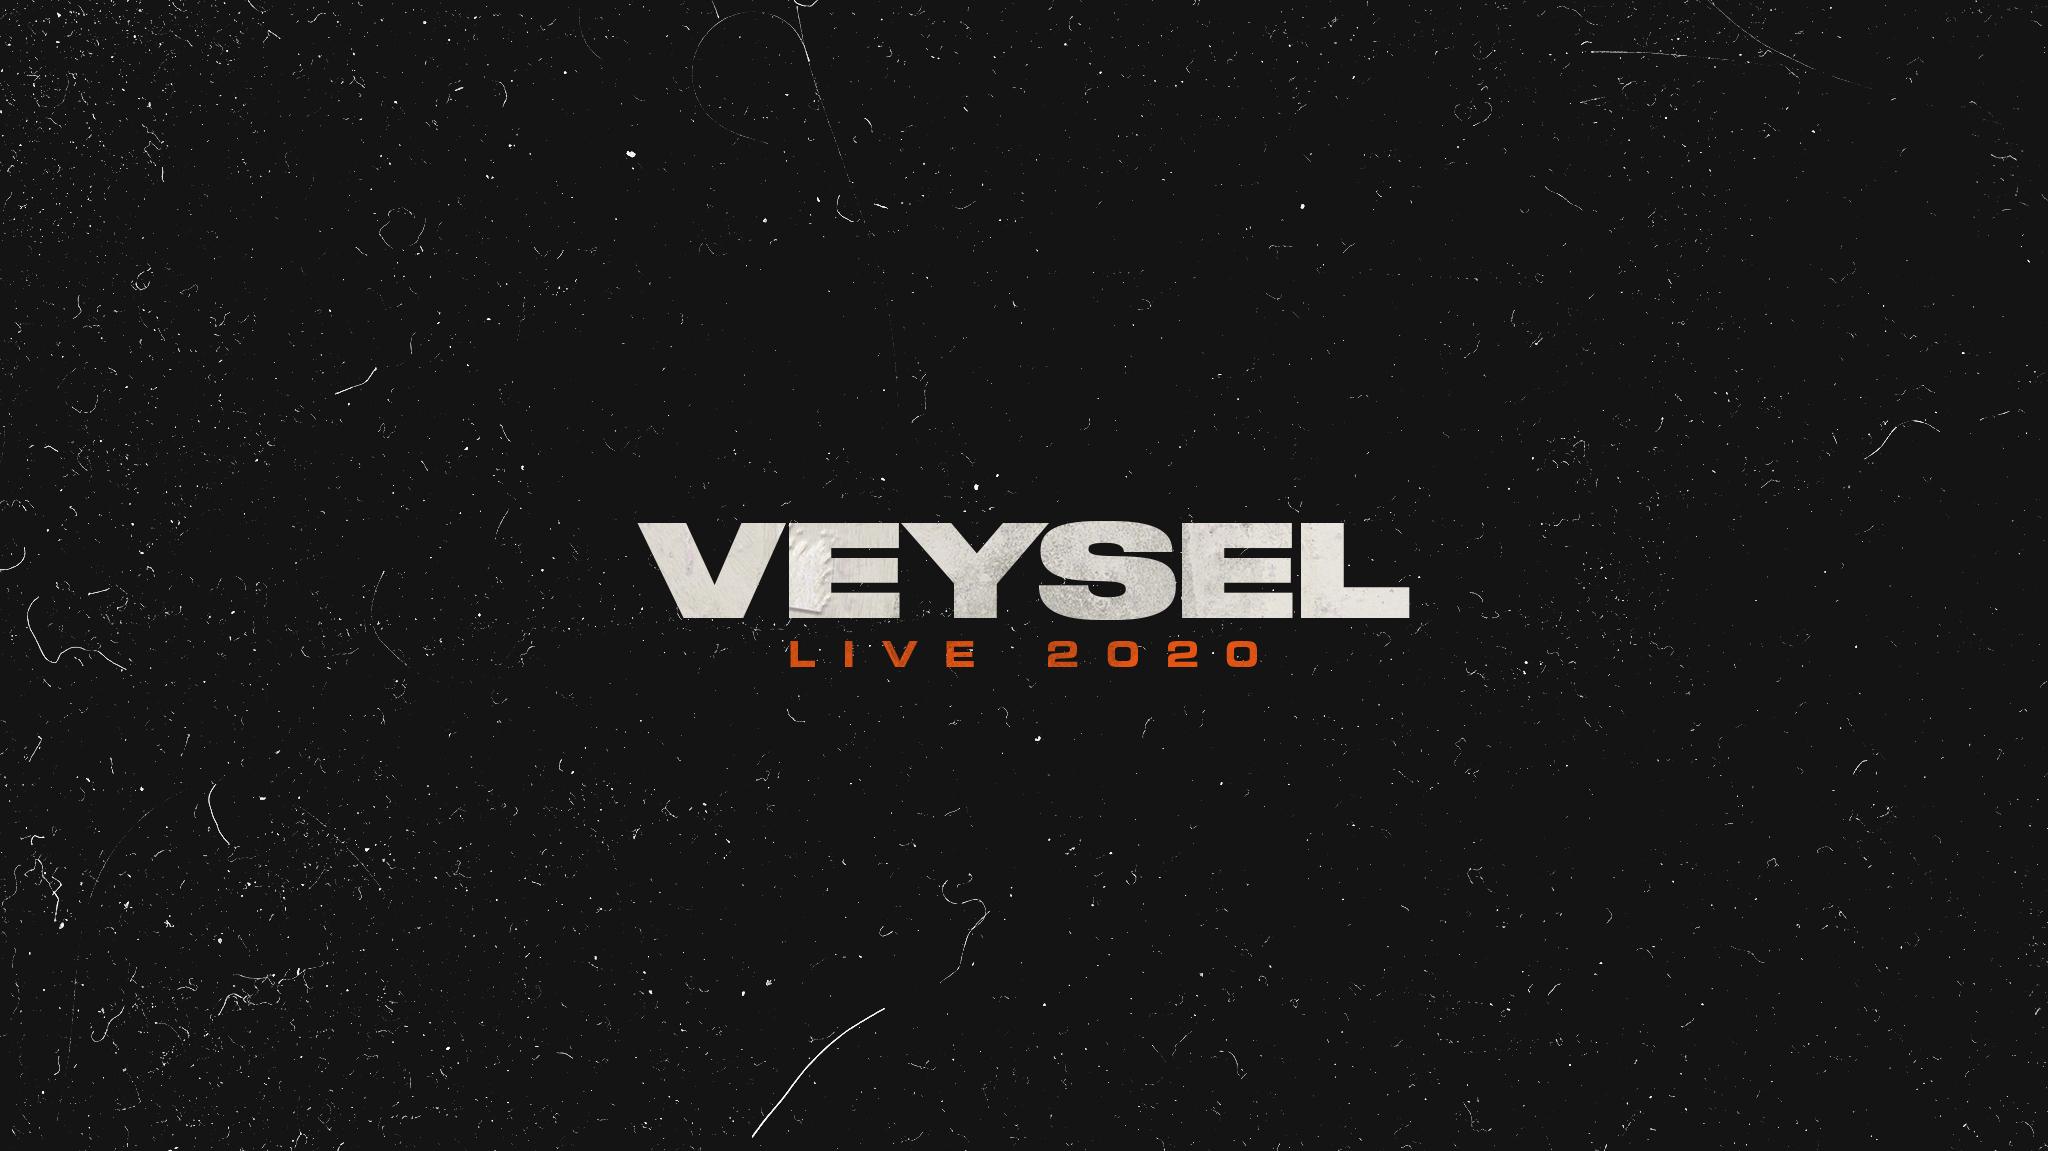 Veysel am 18. April 2020 @ Das Werk.